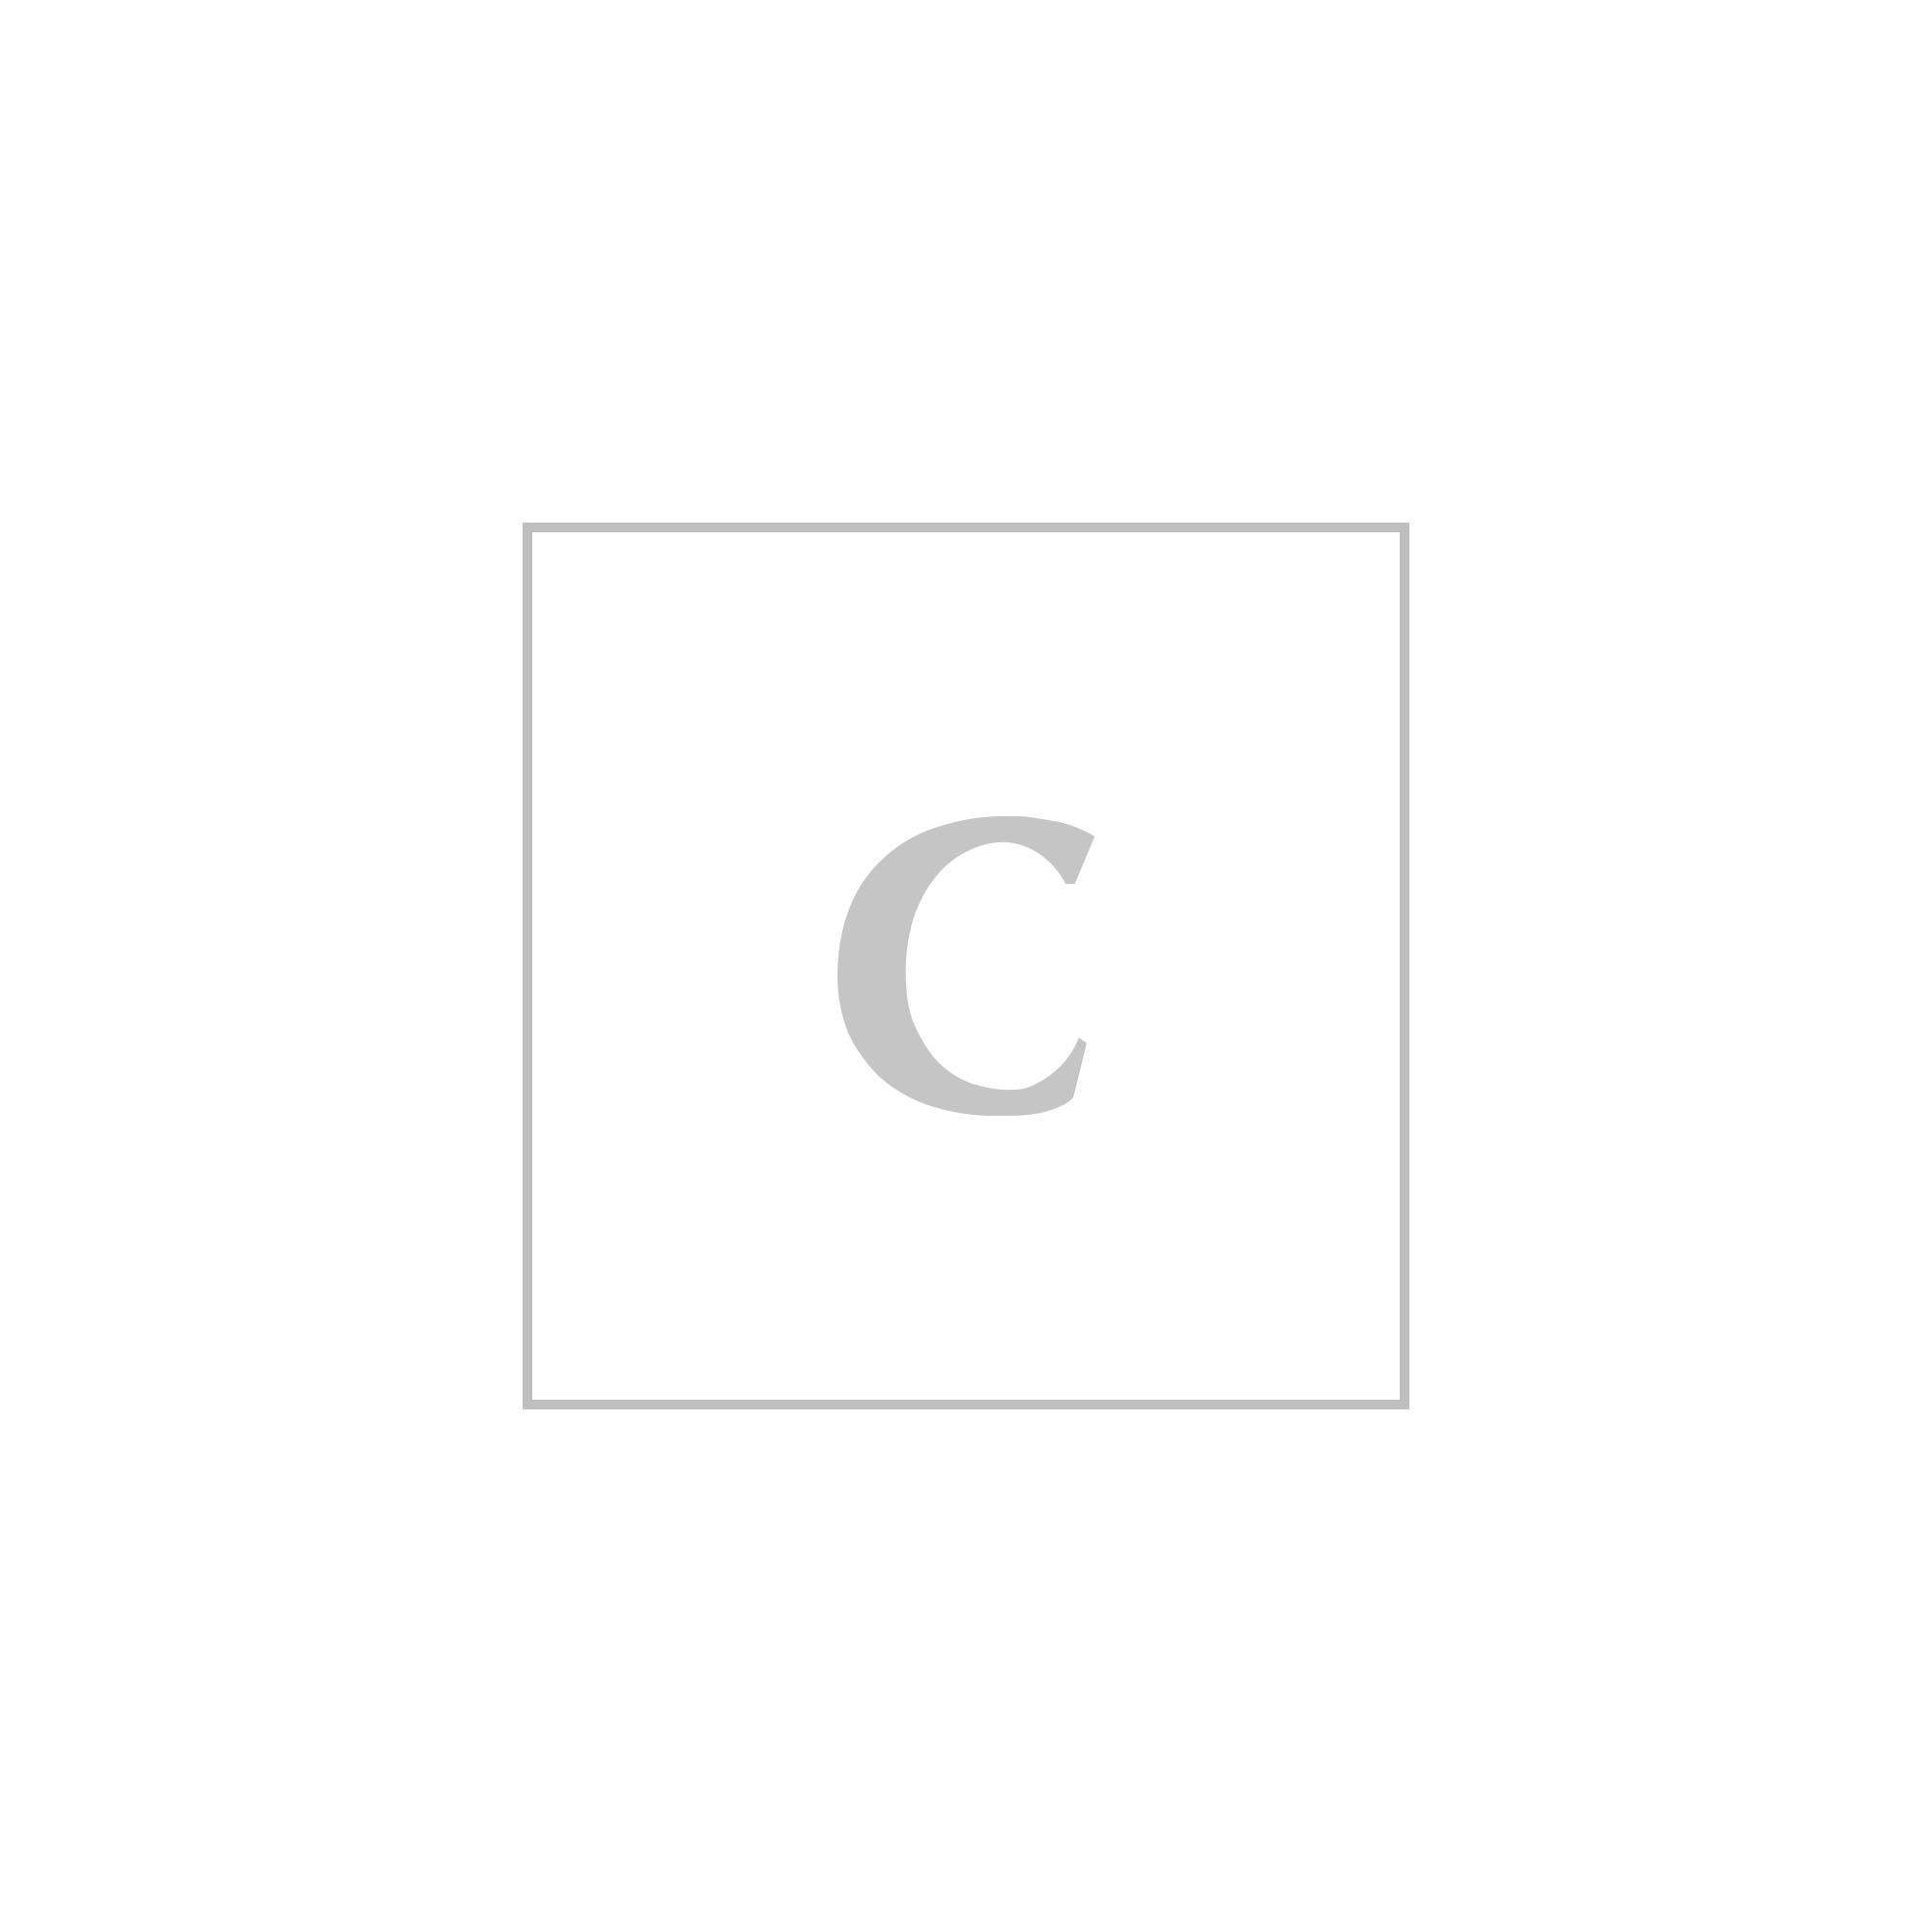 bfc4e55f t-shirt_stone-island_bianco_191689uts000003-v0097-3.jpg